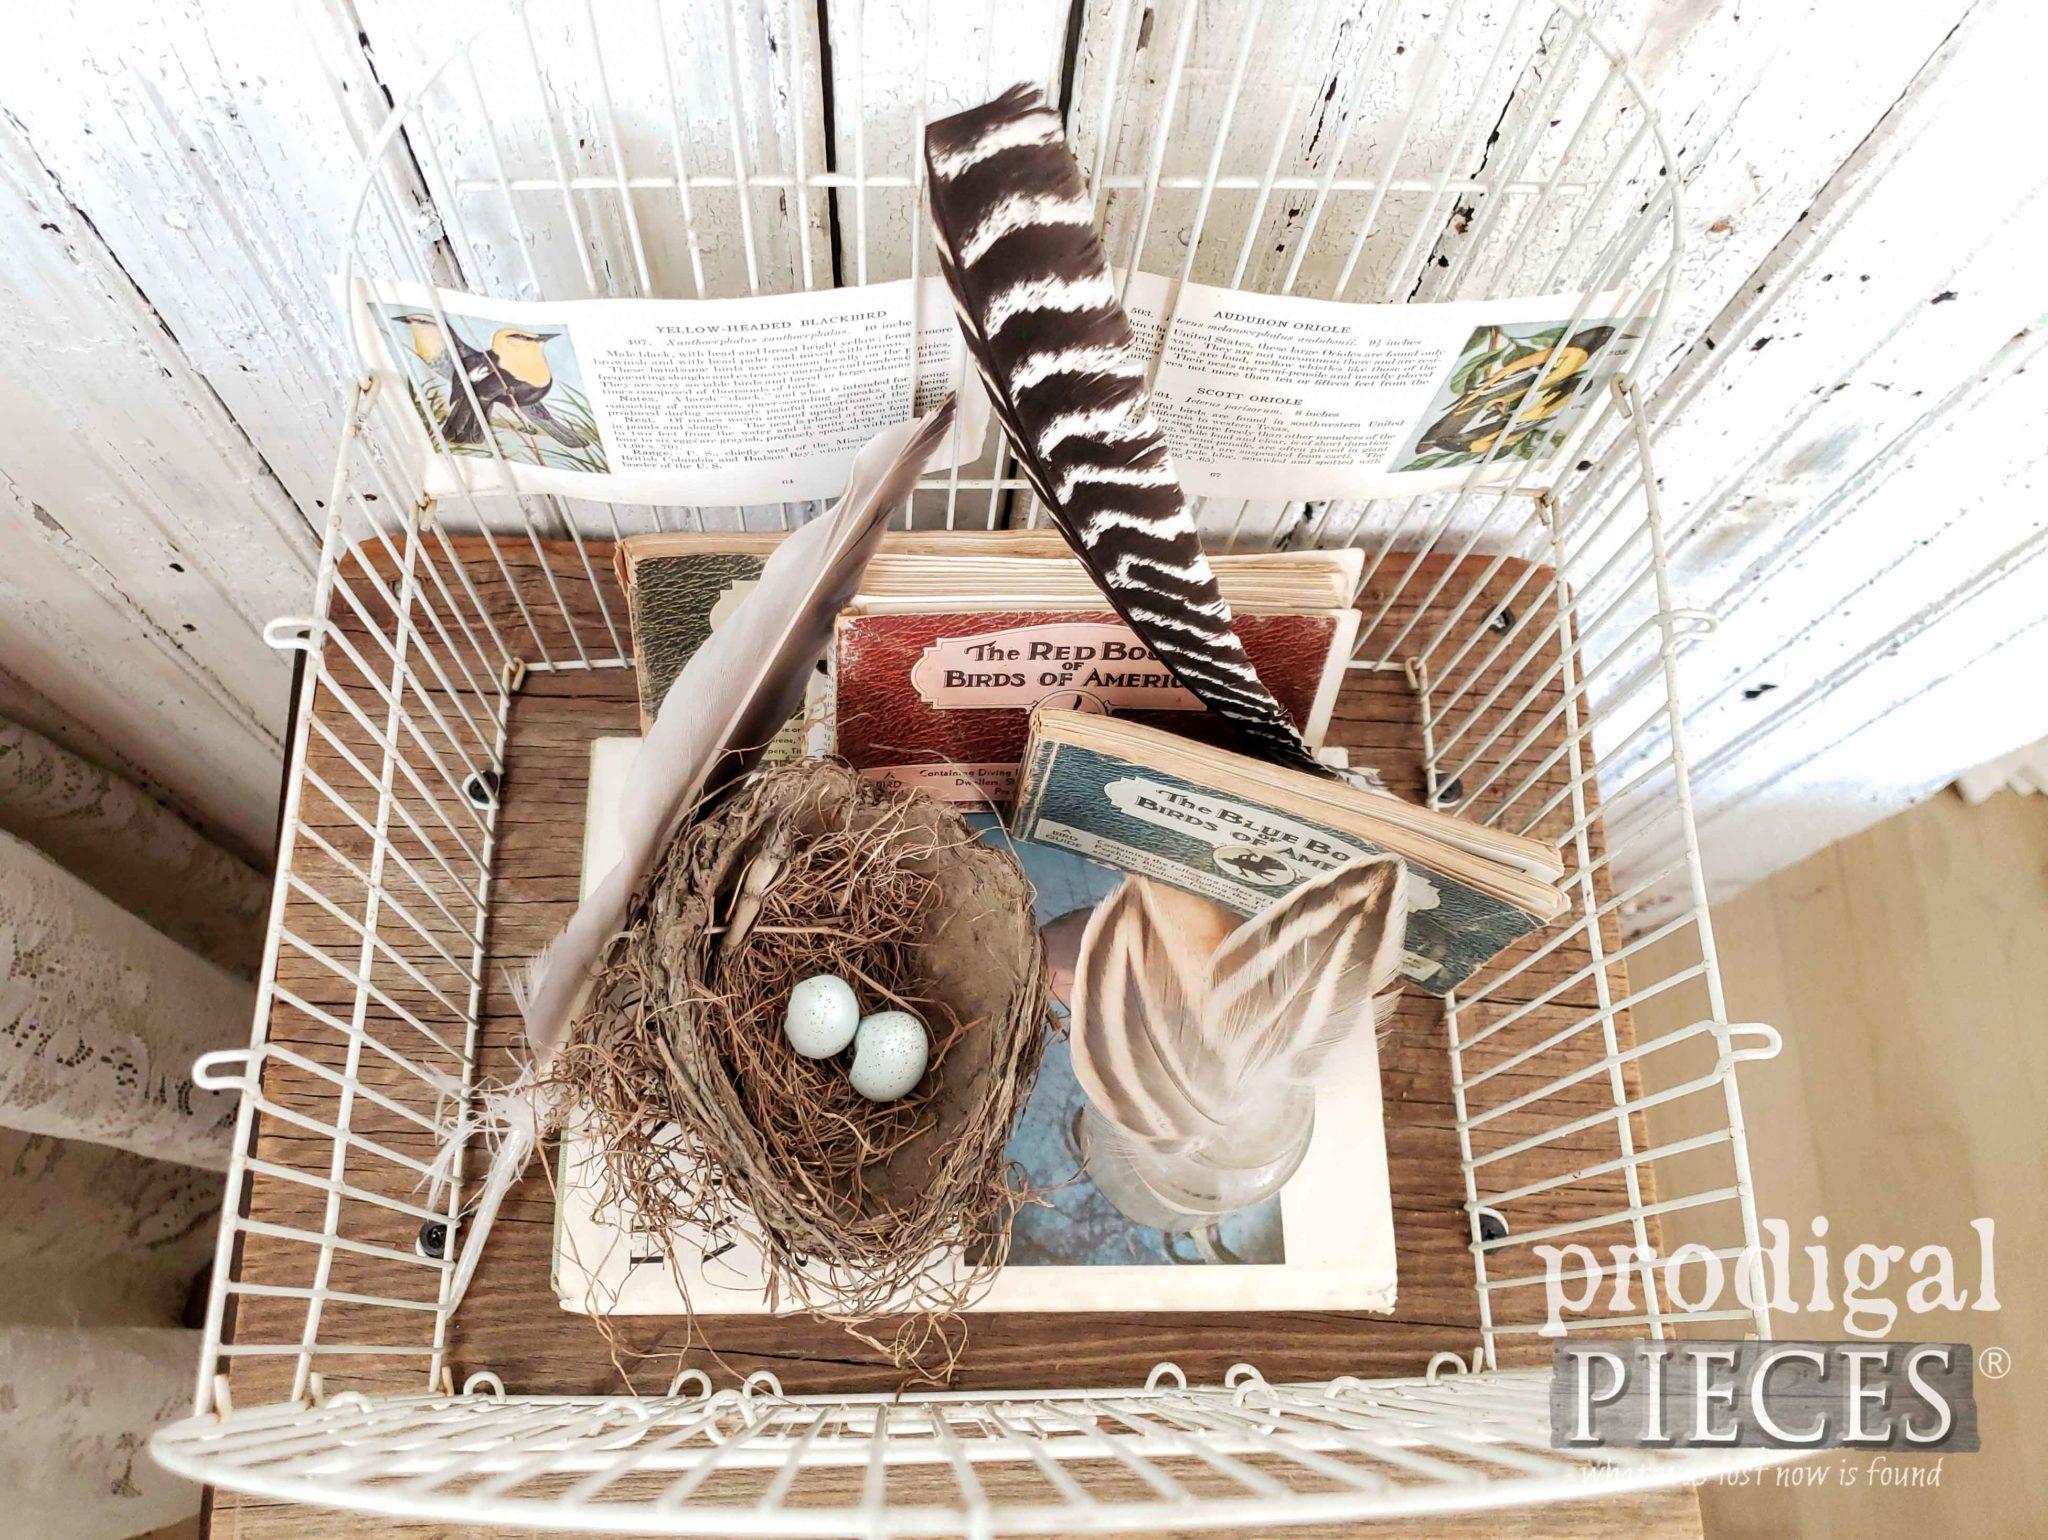 Birding Vignette for Farmhouse Decor by Larissa of Prodigal Pieces | prodigalpieces.com #prodigalpieces #farmhouse #birds #home #homedecor #diy